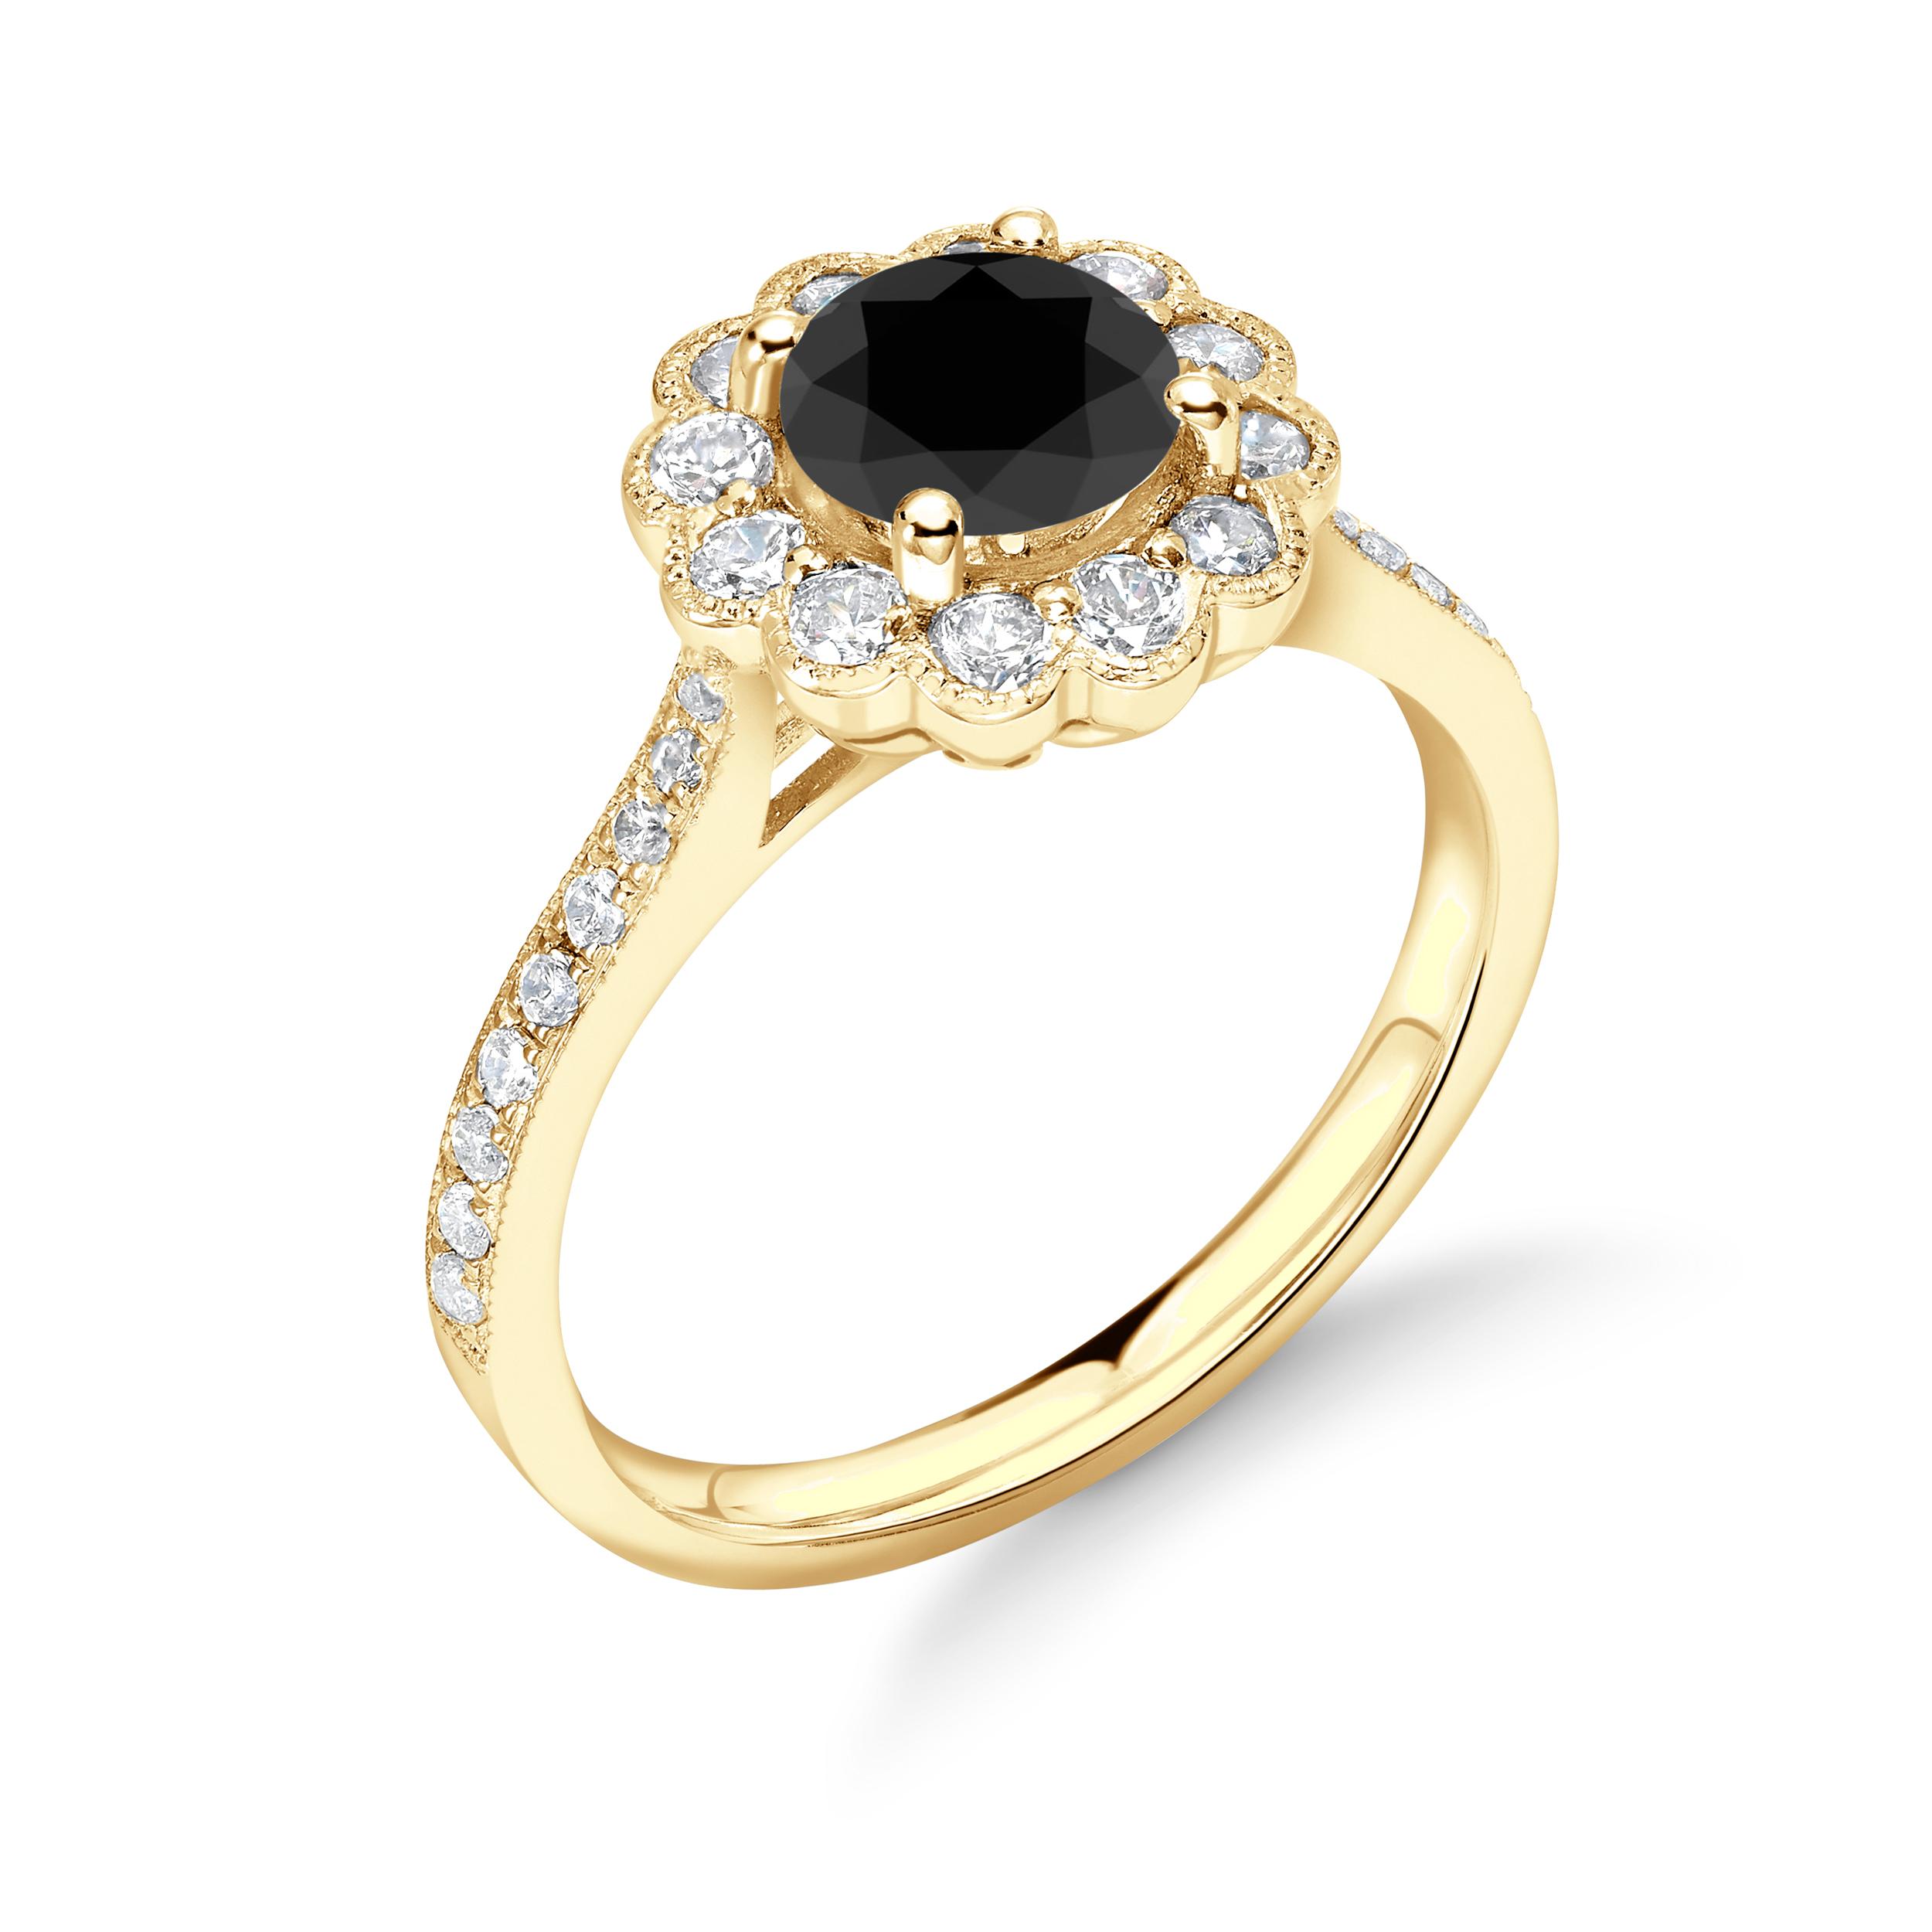 Vintage Style Miligrain Round Diamond Halo Black Engagement Rings